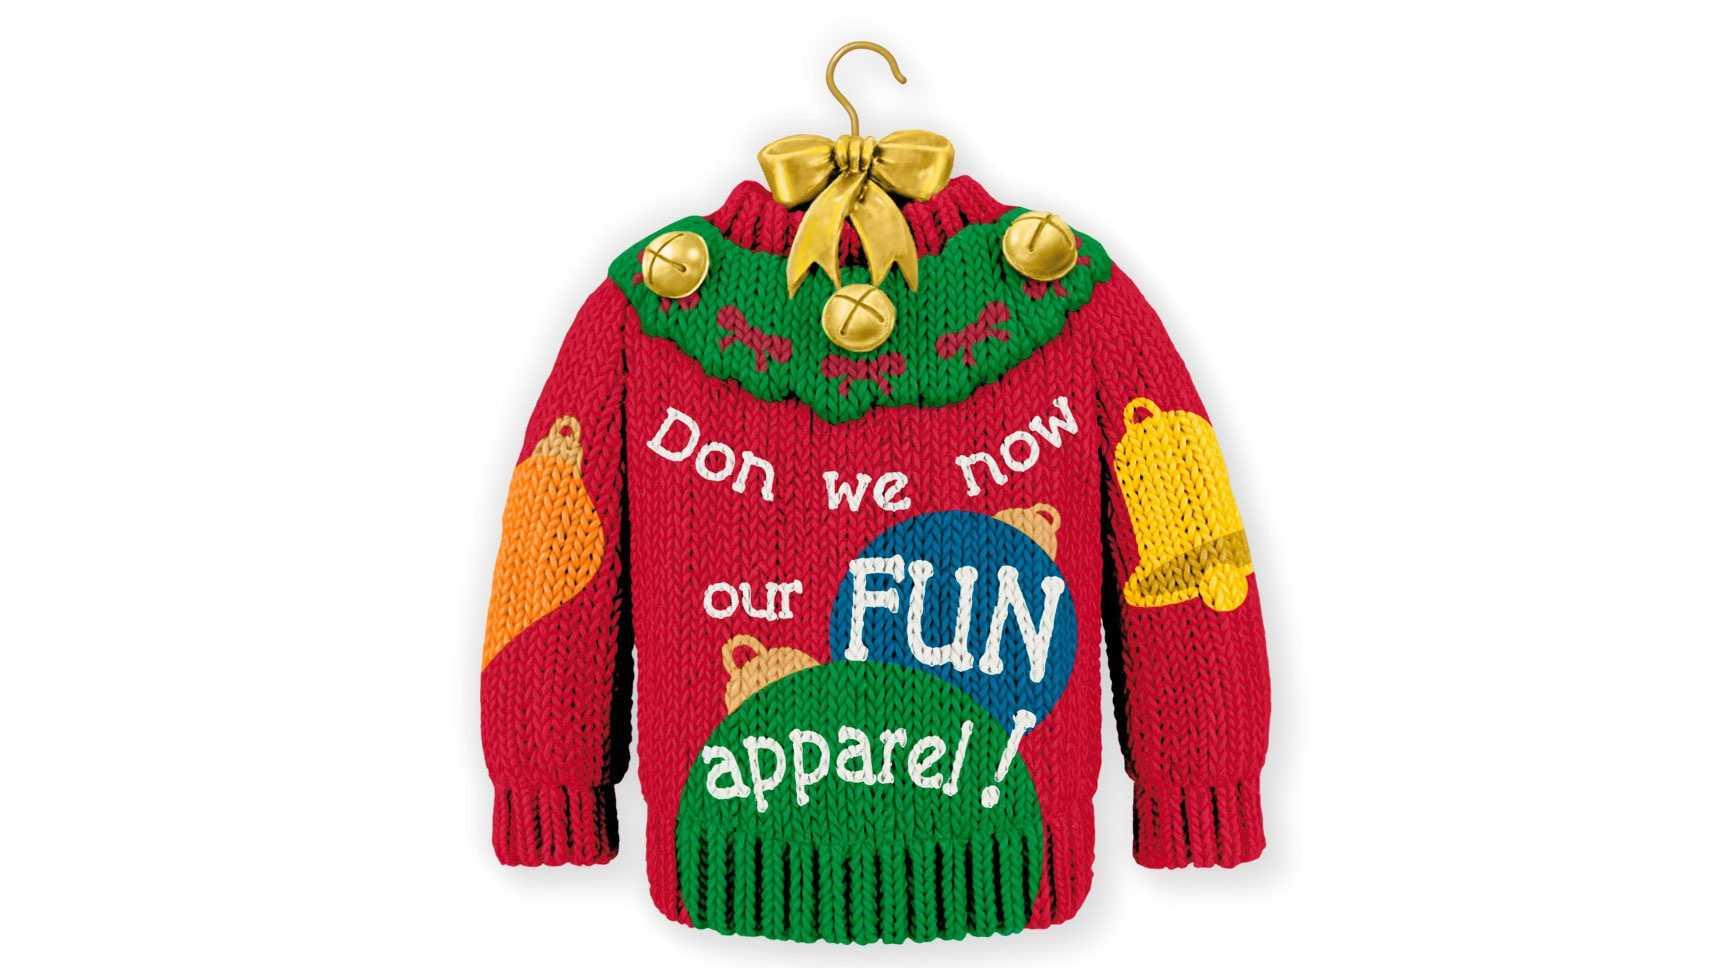 Hallmark sweater ornament